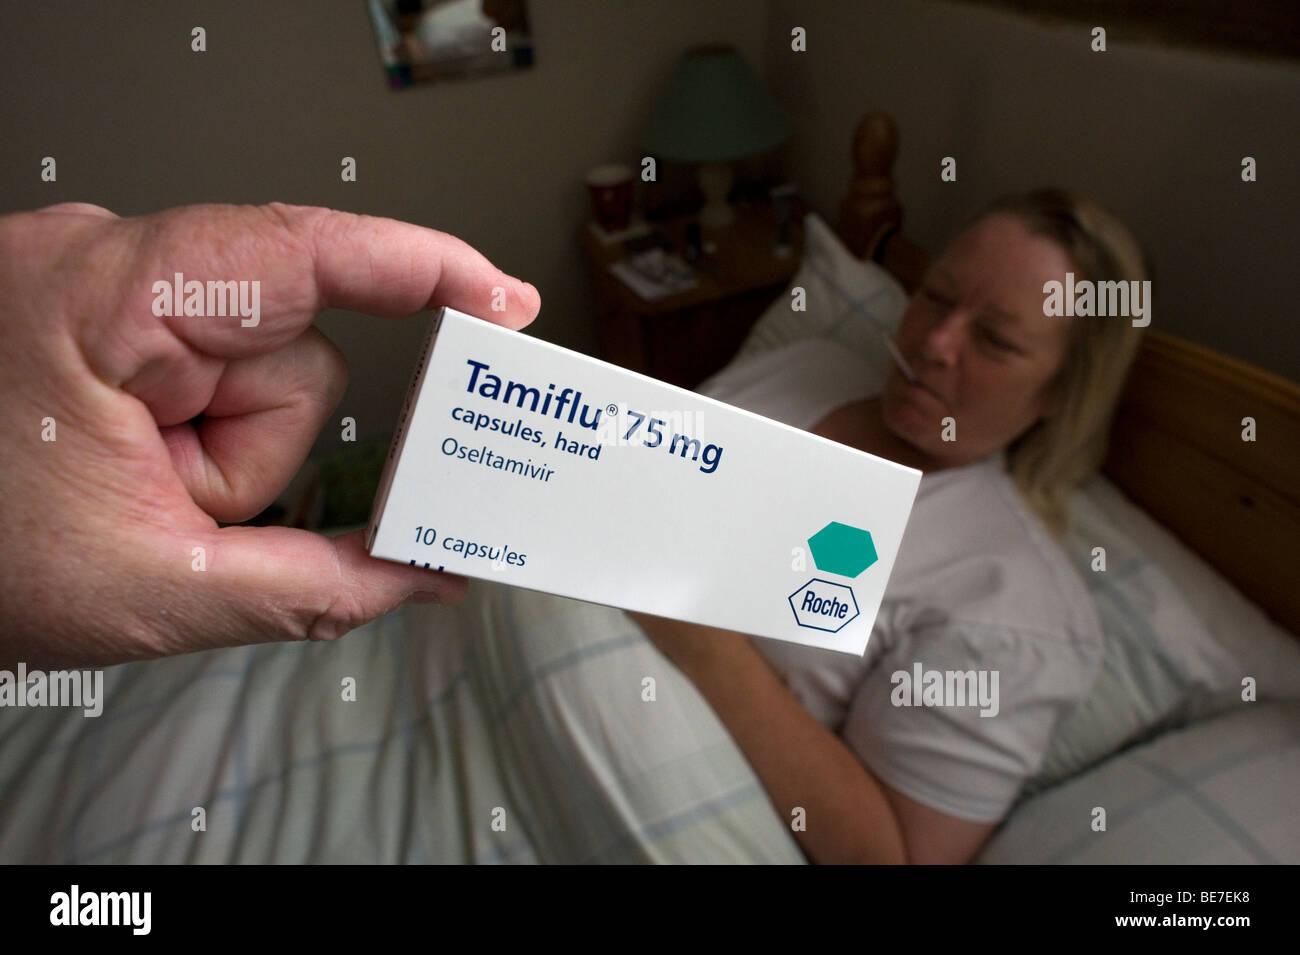 Swine Flu Tamiflu Roche ill temperature woman real model released - Stock Image